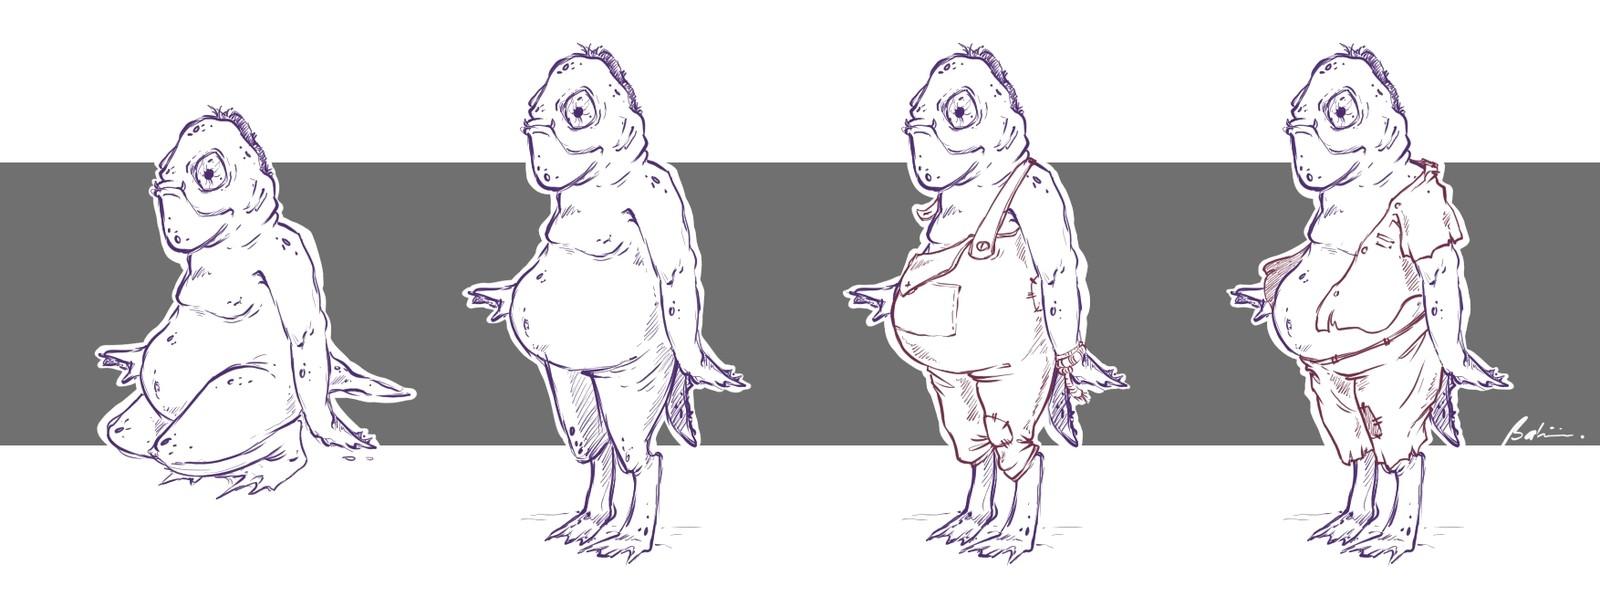 Full body sketches of the fishmen